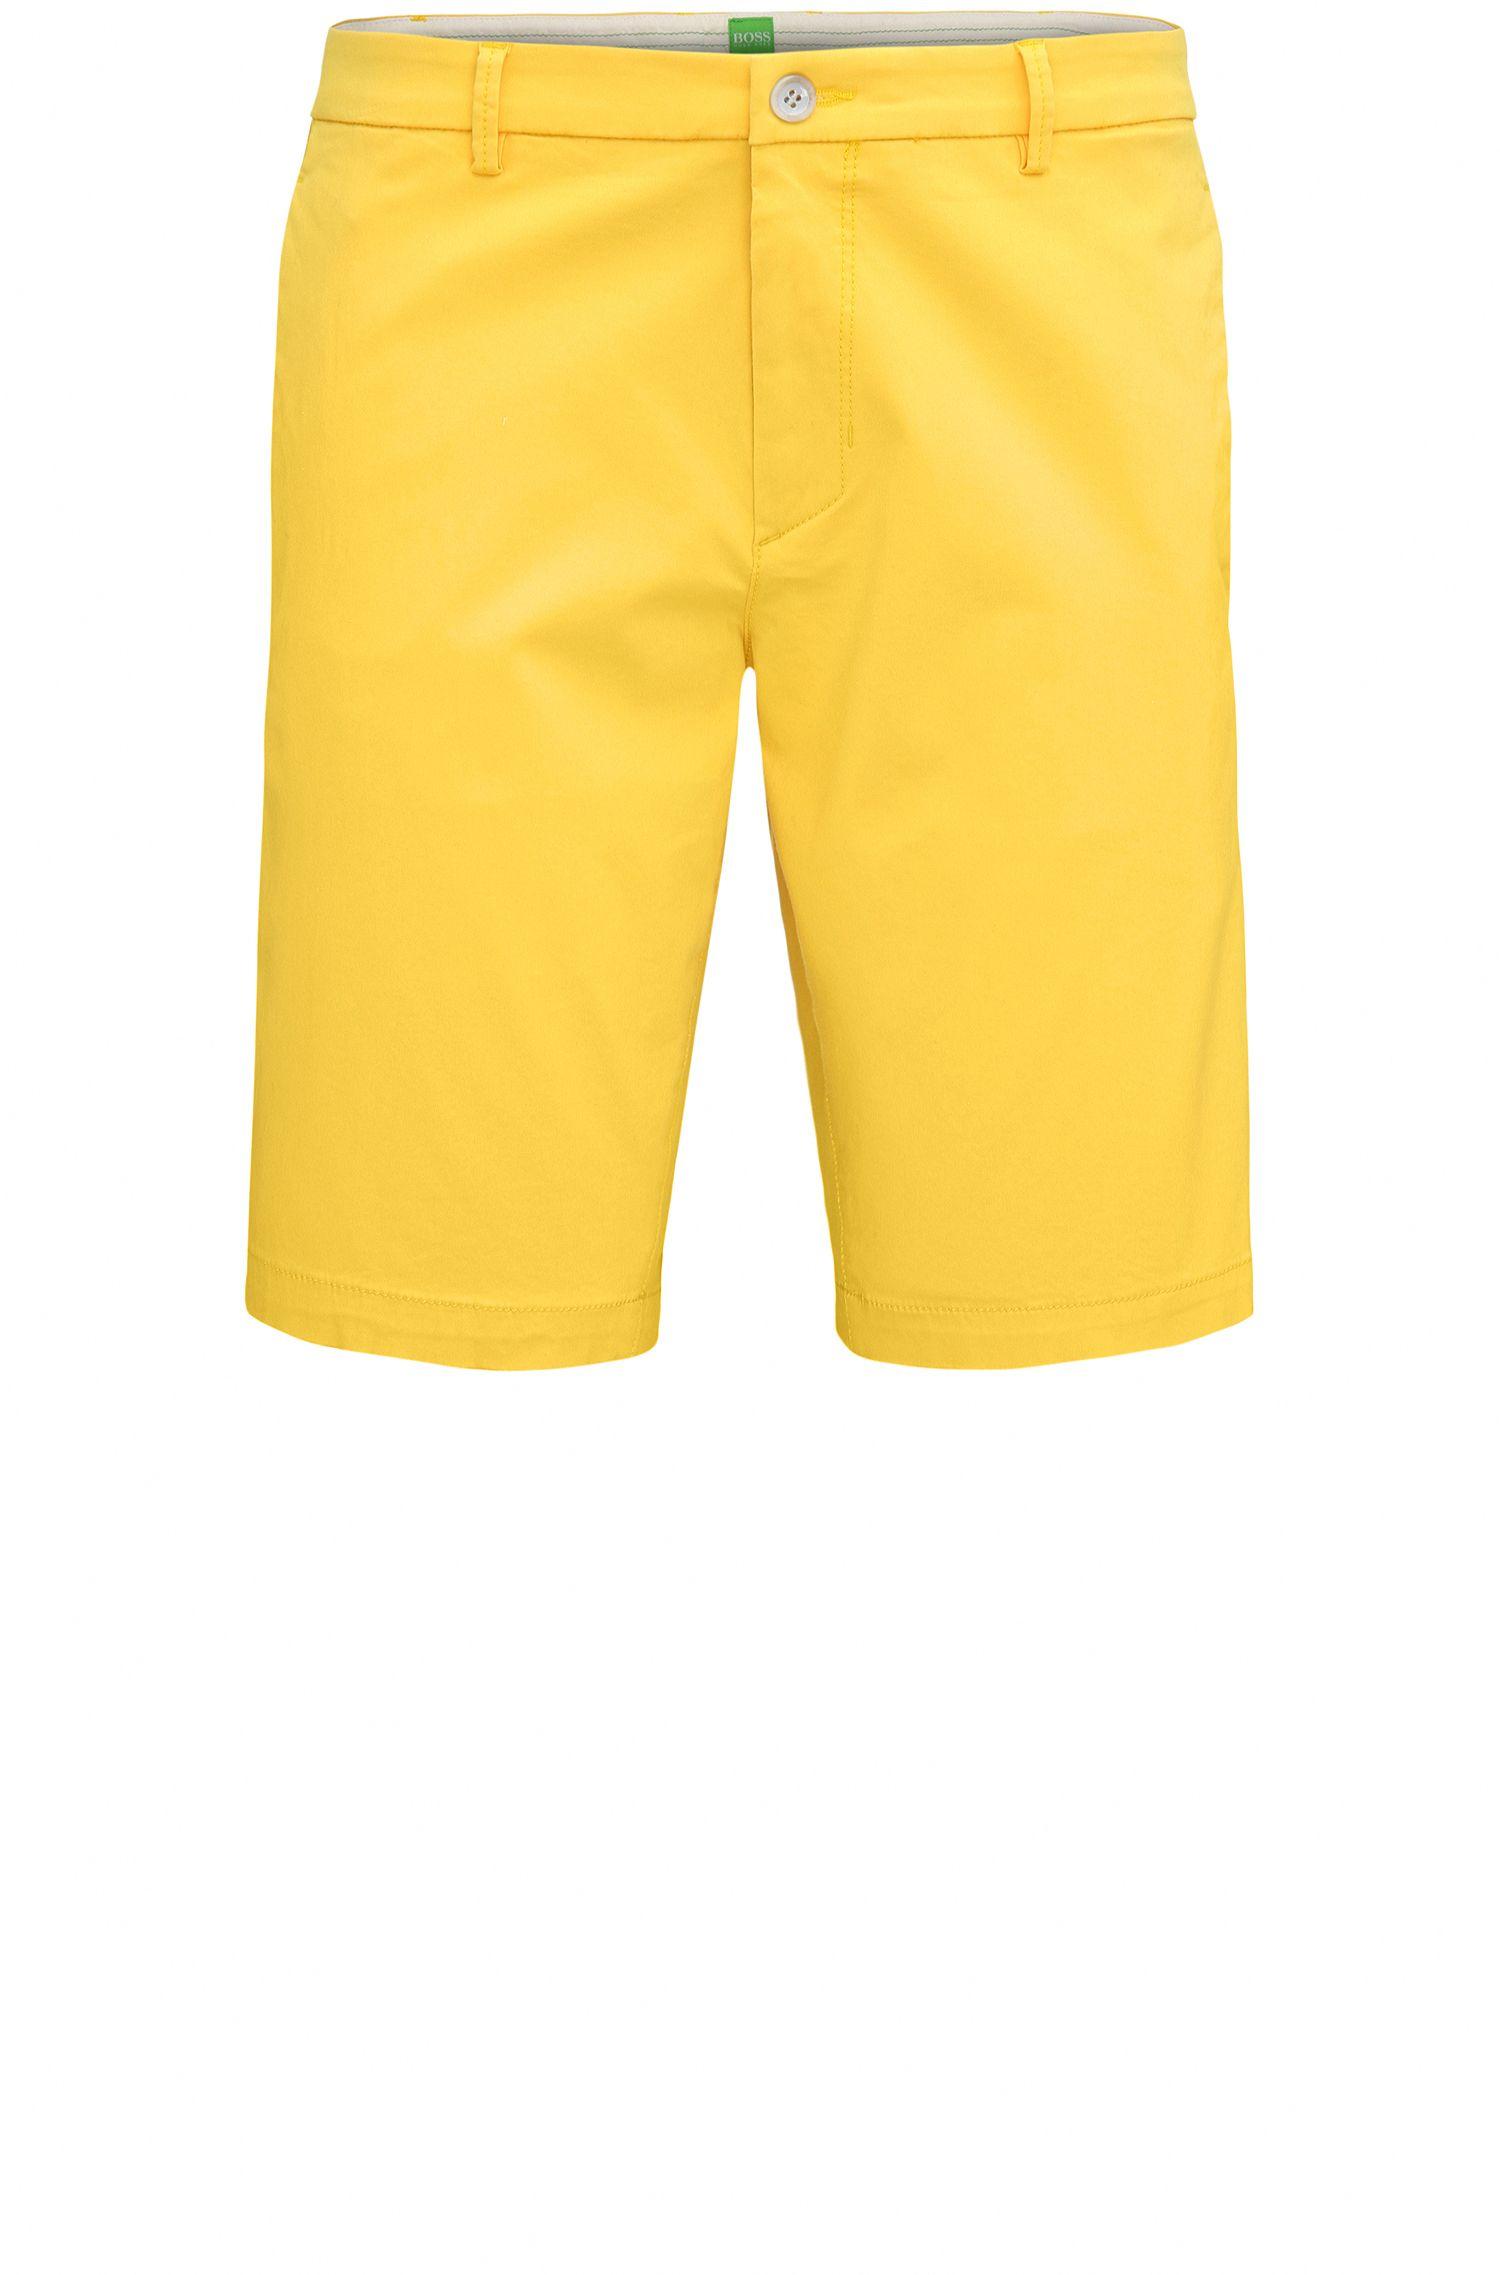 Satin Stretch Cotton Shorts, Slim Fit | Liem W